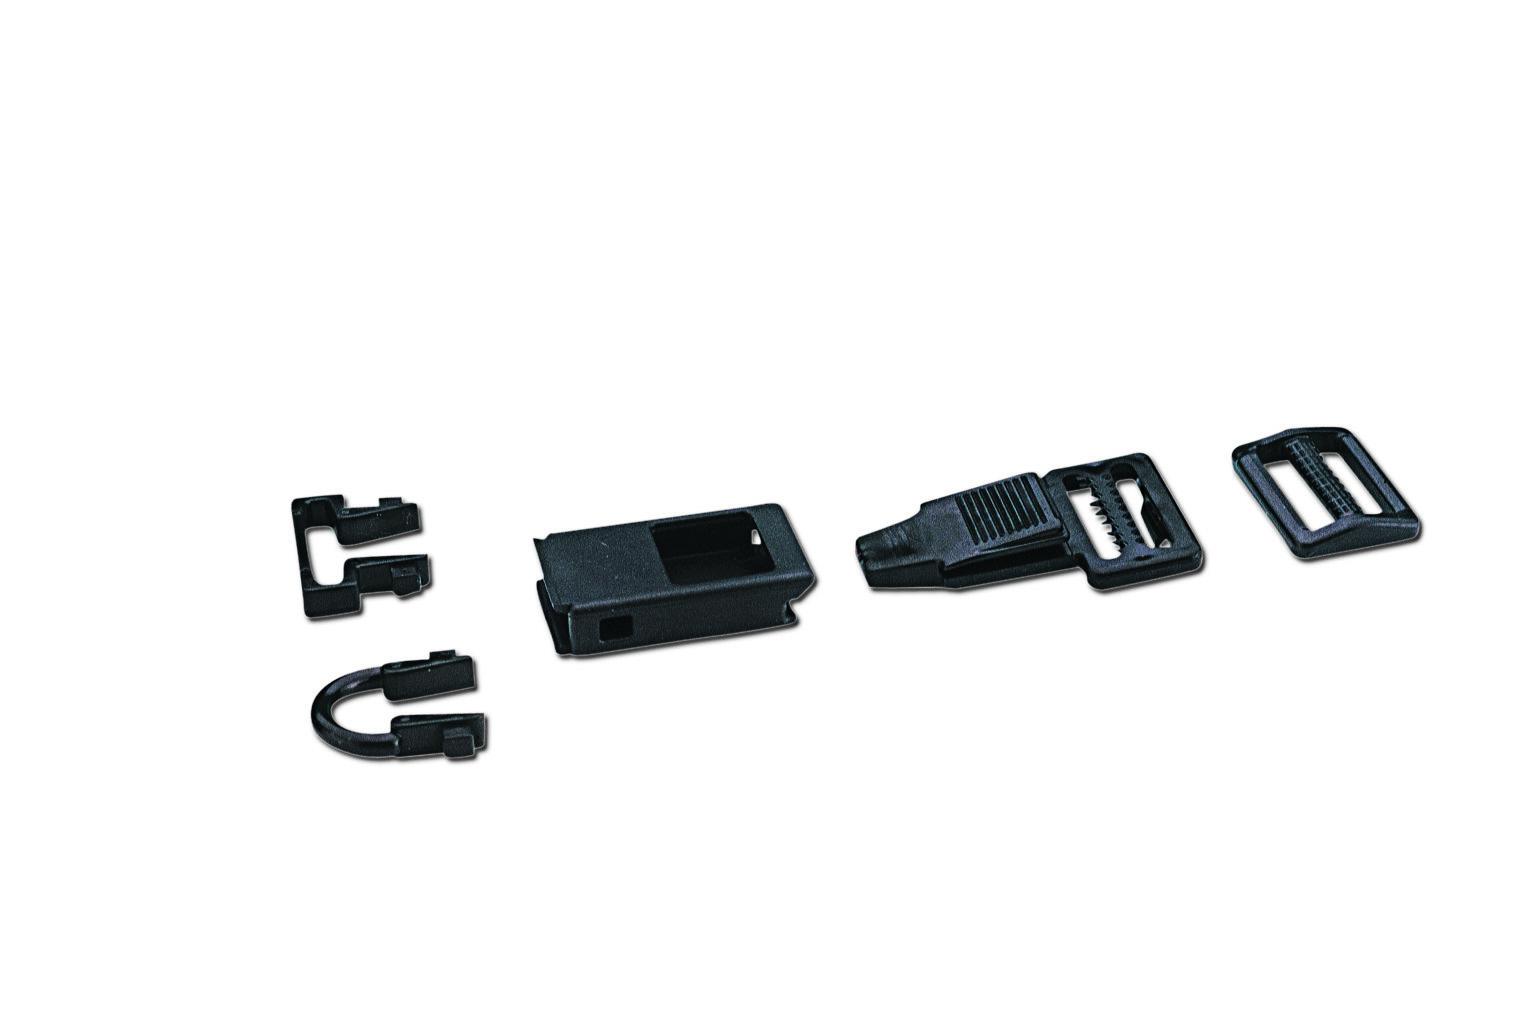 Black Raider FH-100 Quick Release for All Raider Helmet Straps